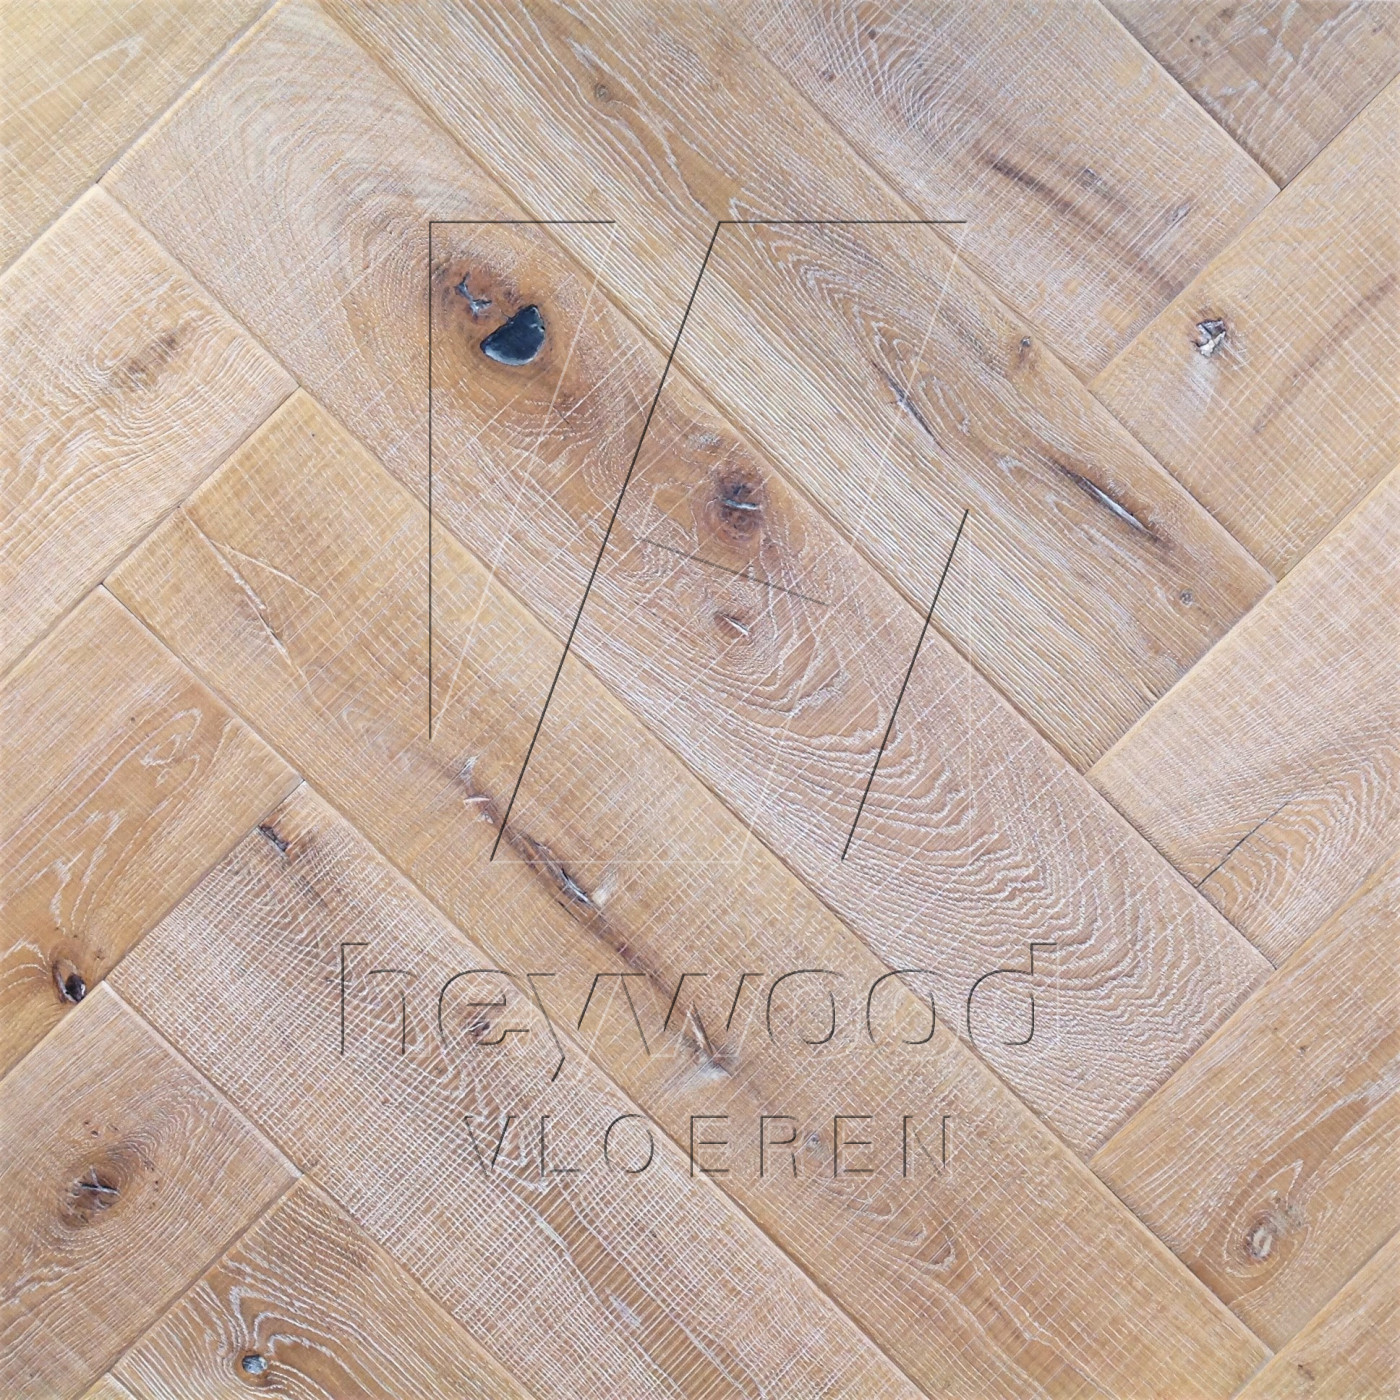 Knotting Hill Herringbone 'Lappland' in Herringbone of Pattern & Panel Floors